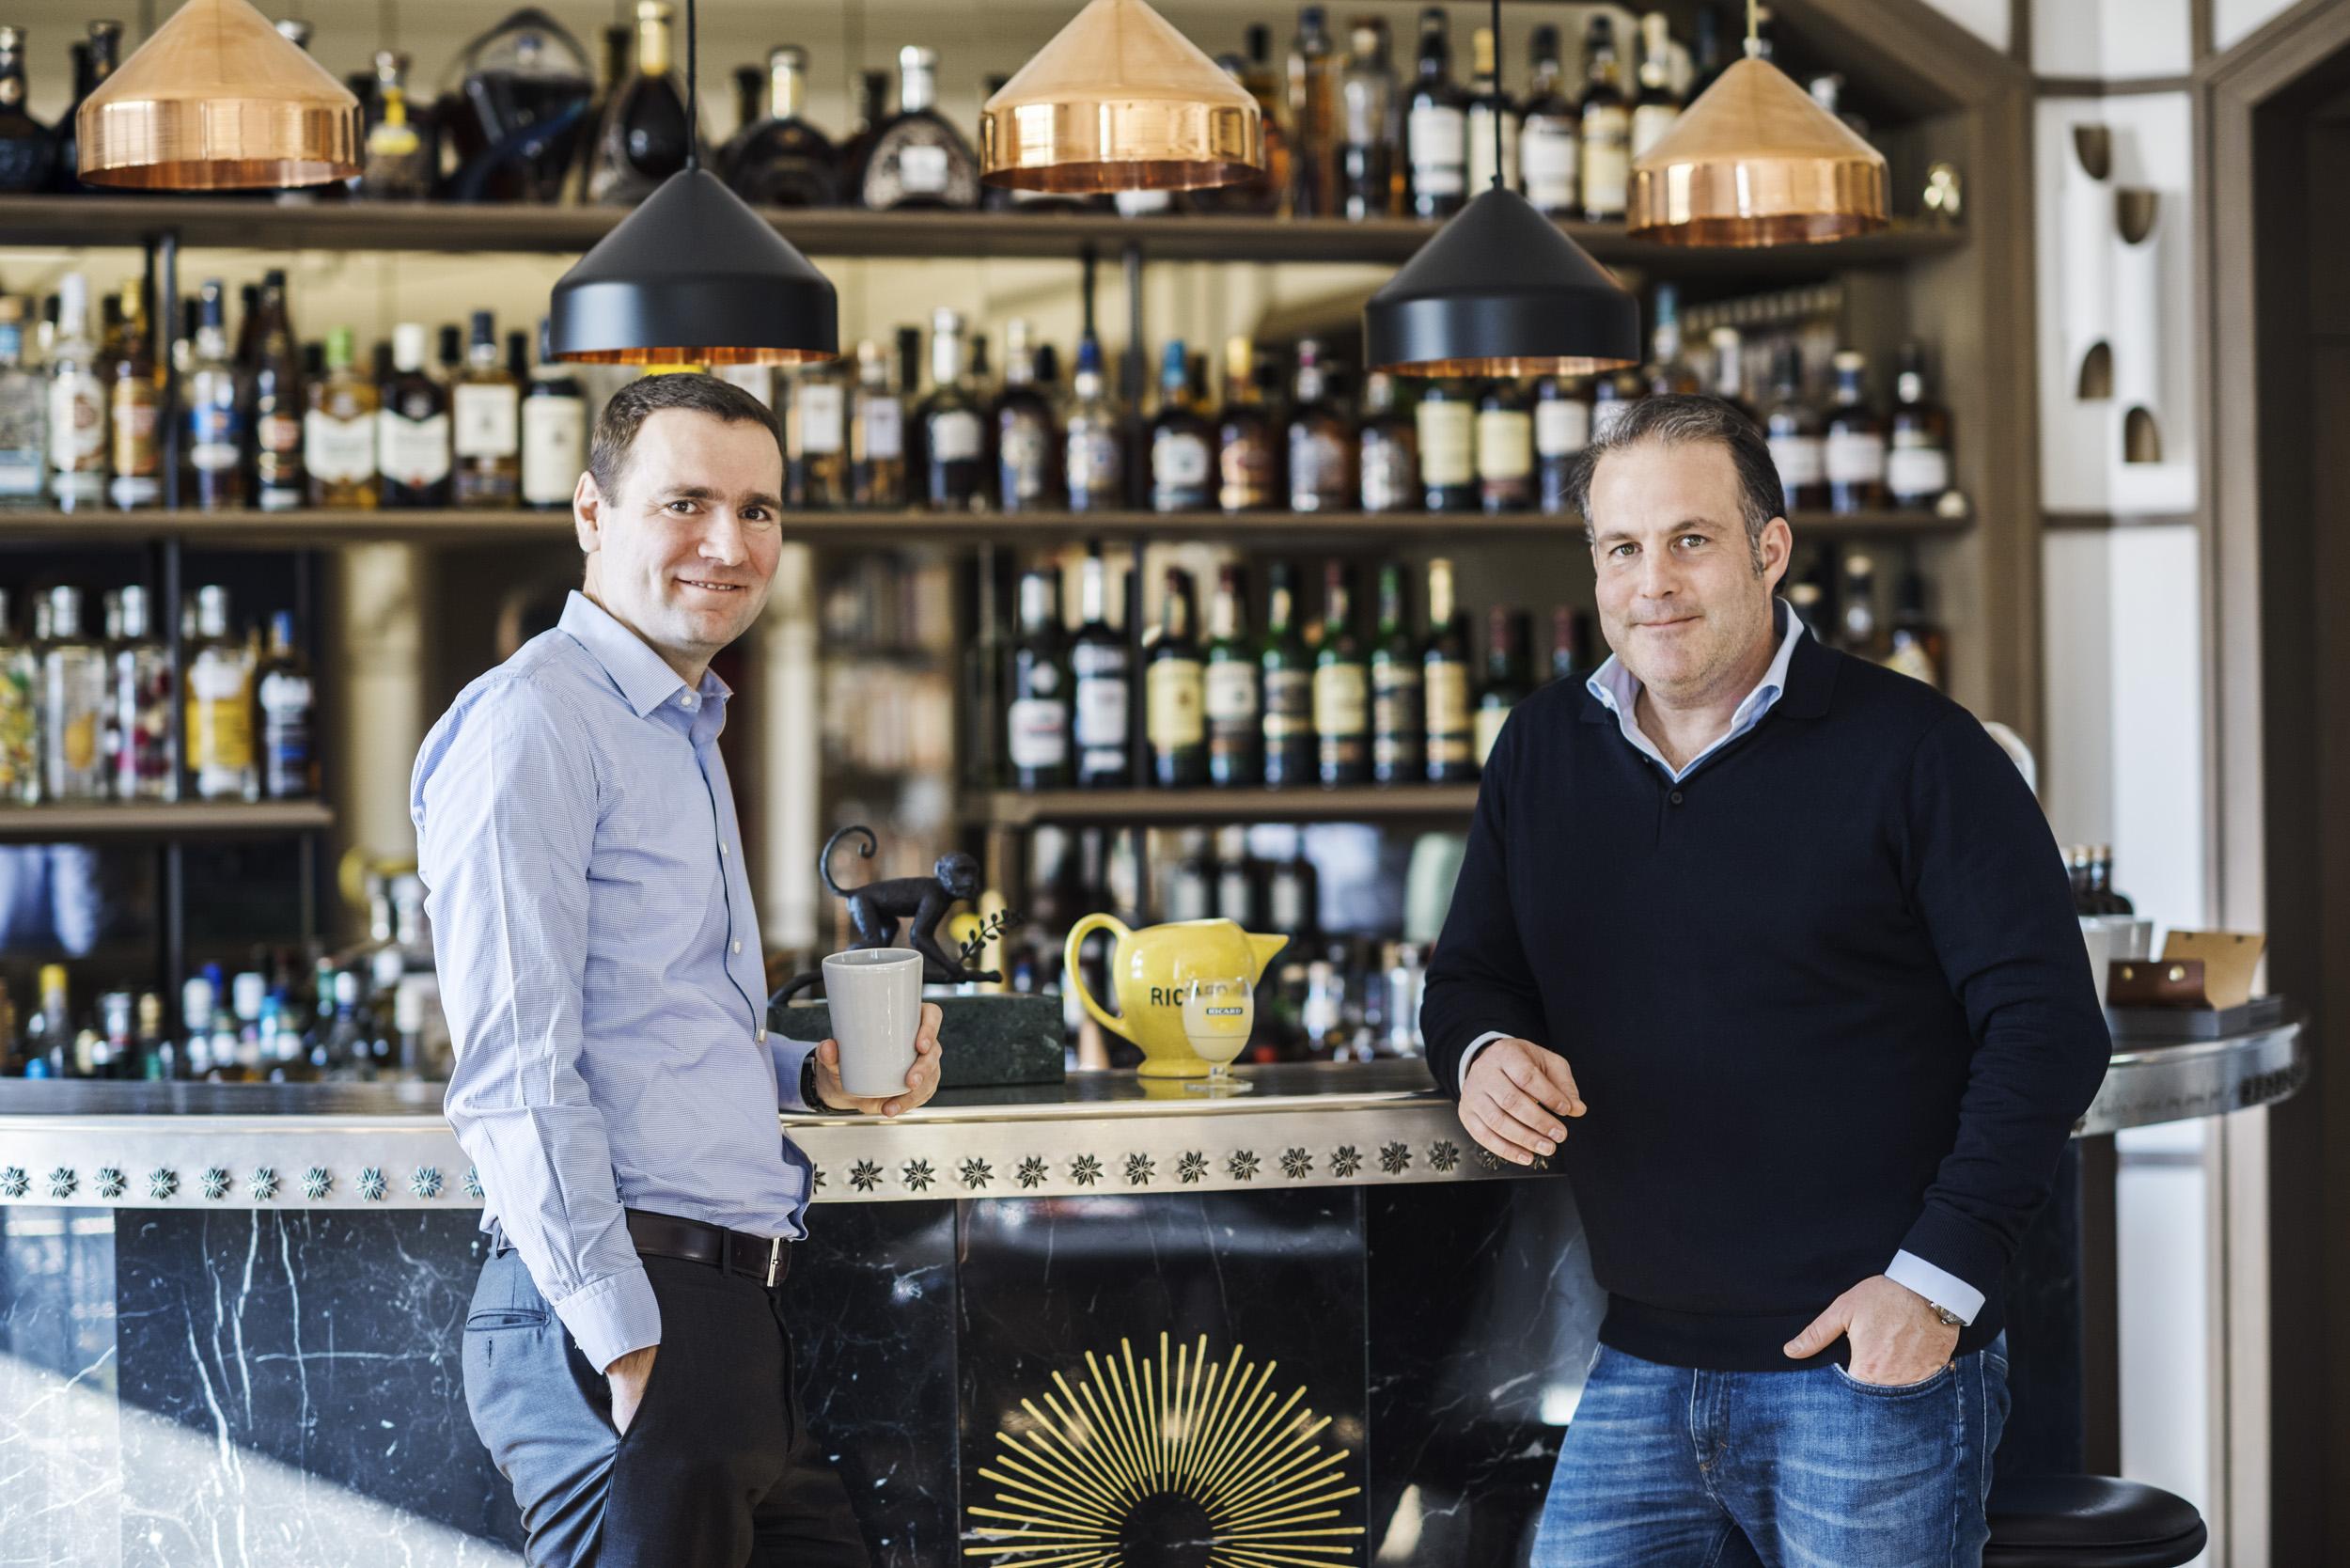 Monkey 47 et Pernod Ricard s_associent